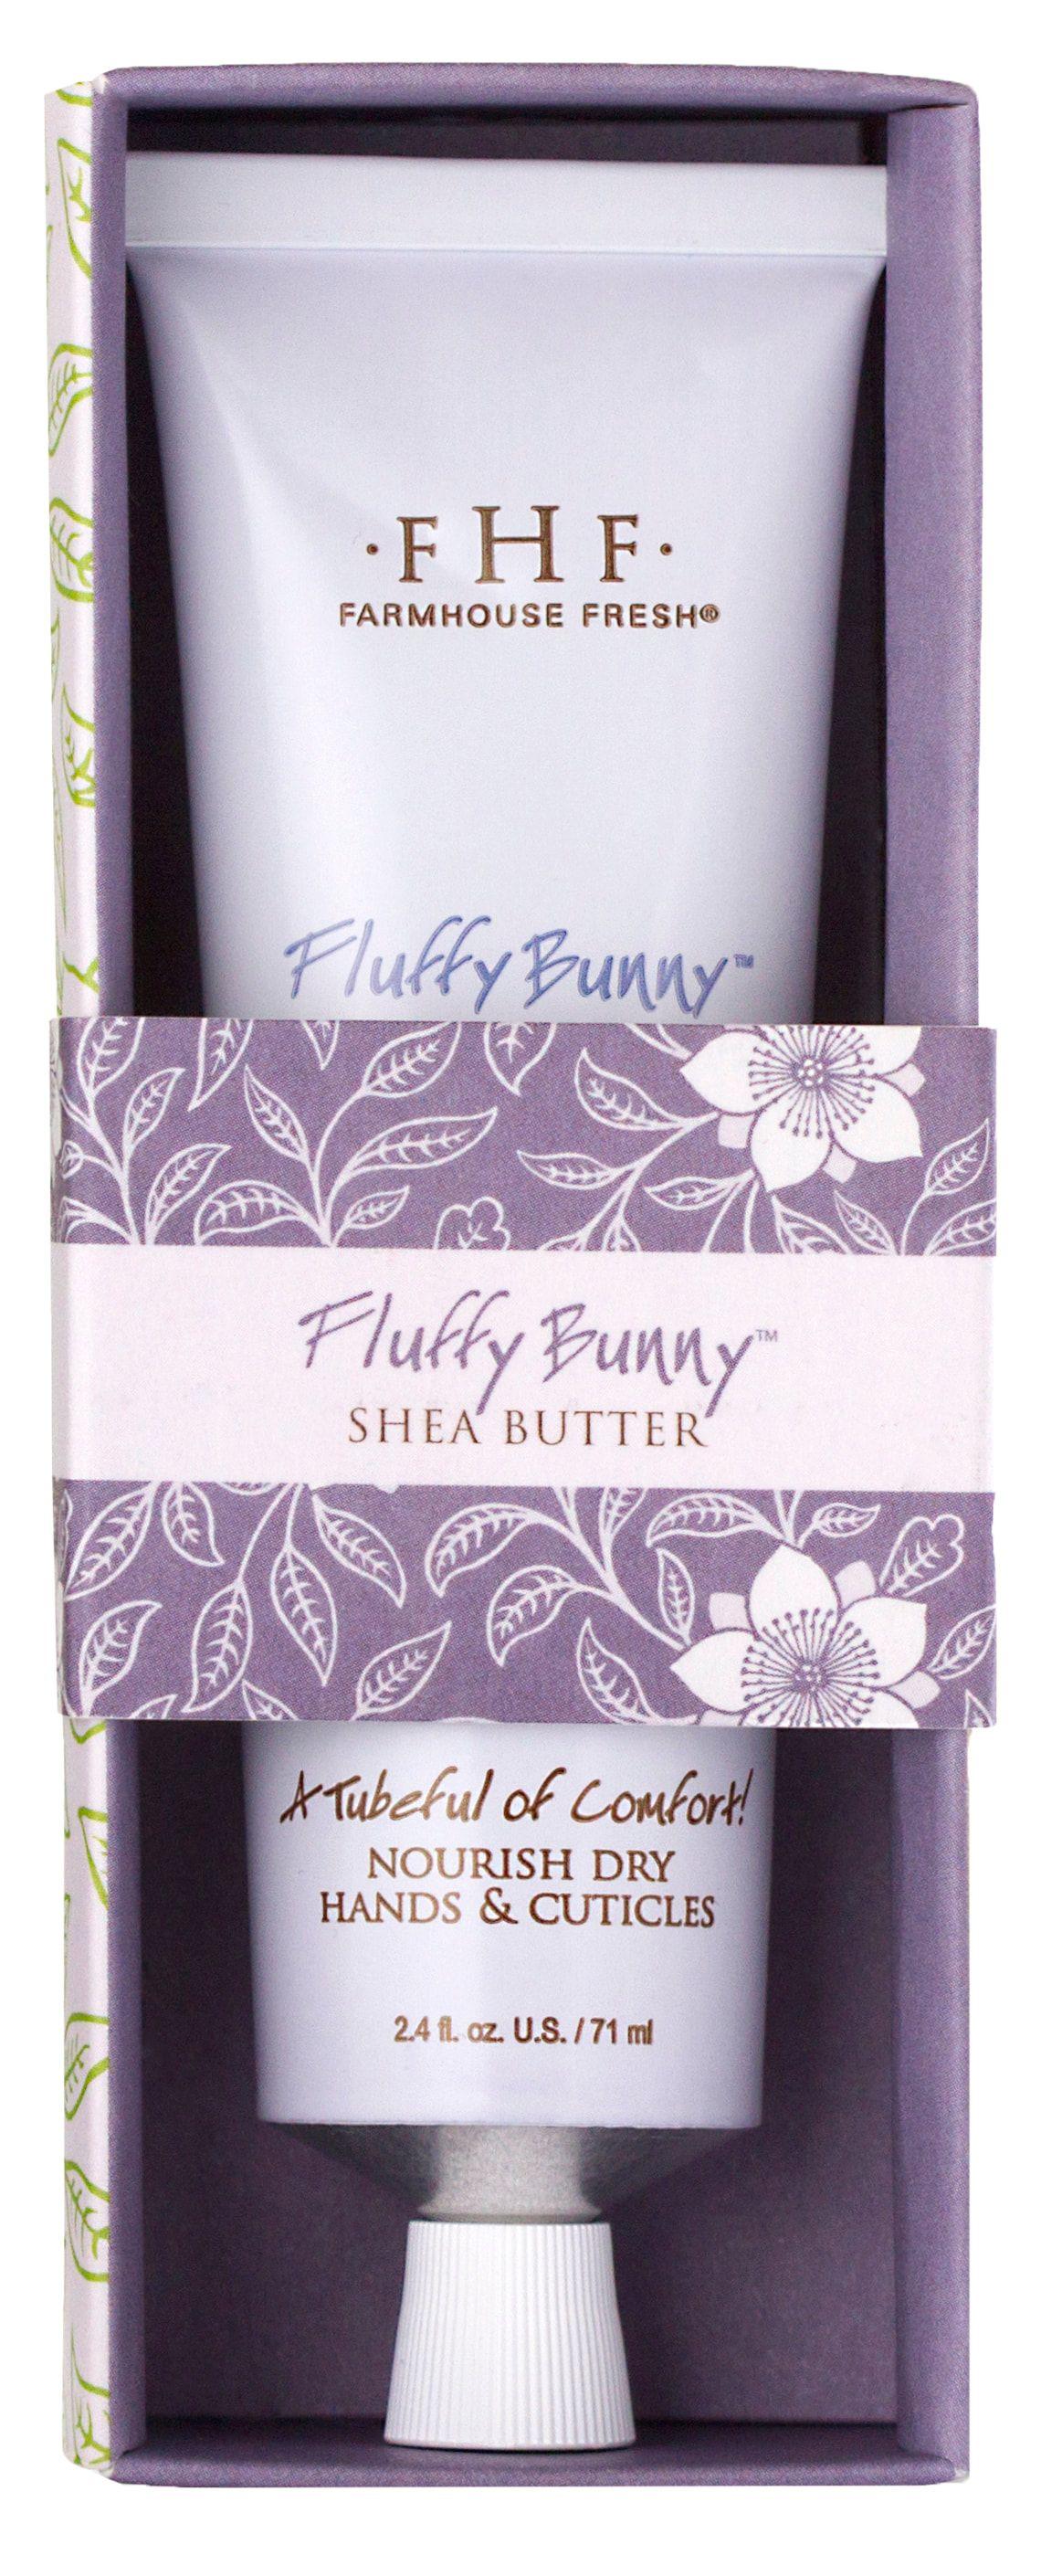 Fluffy Bunny® Shea Butter Hand Cream in 2020 Shea butter